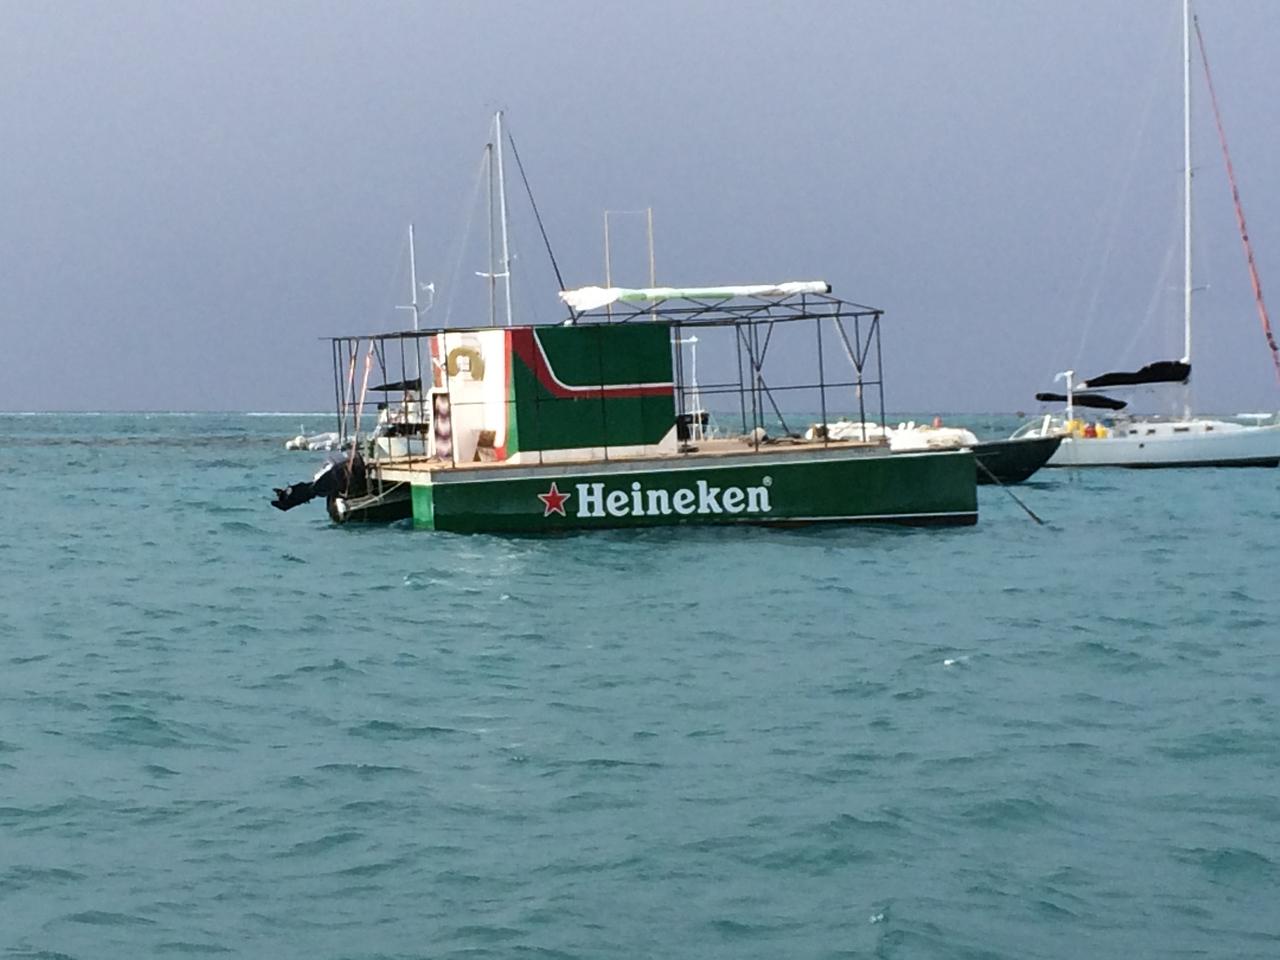 Heineken Boat